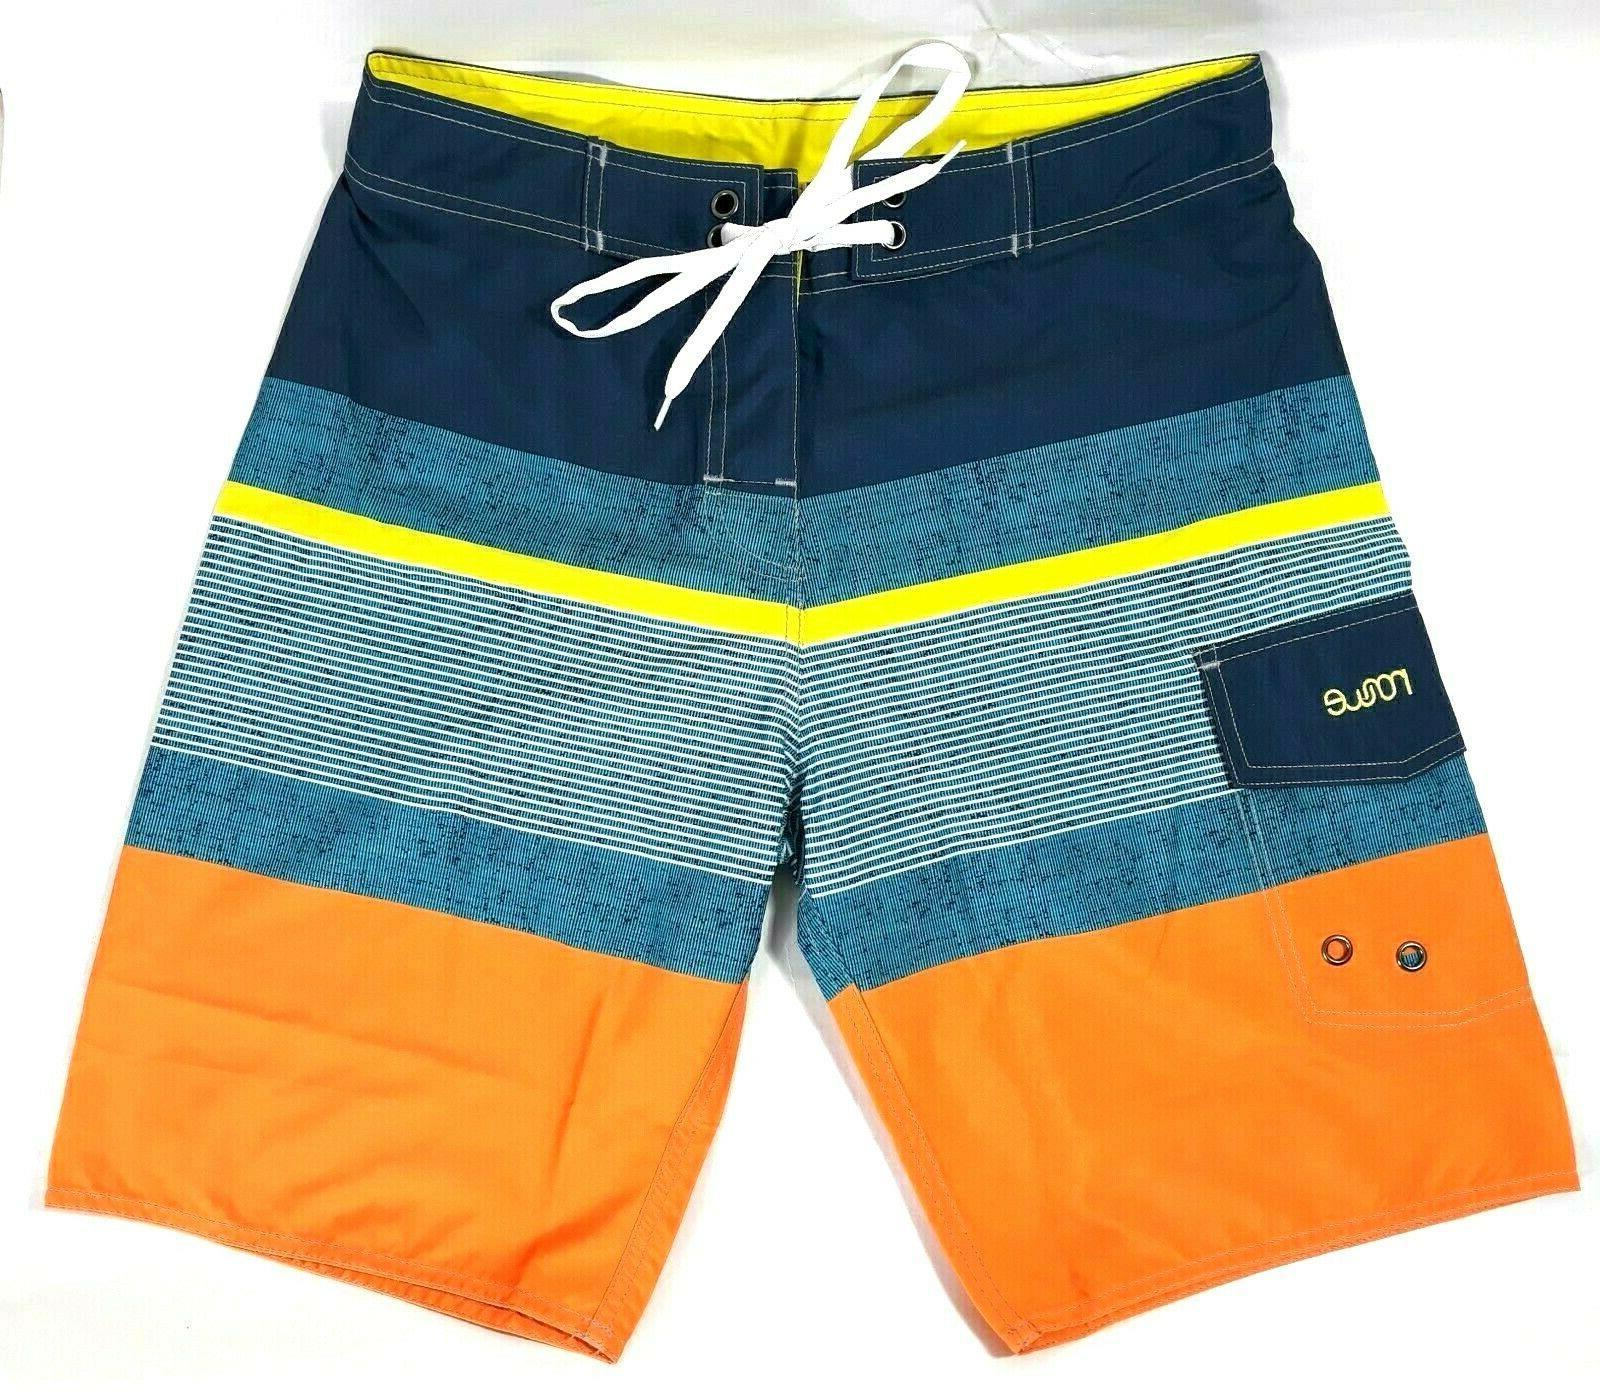 Nonwe Size 30 Board Swim Lined Multi-color NWT